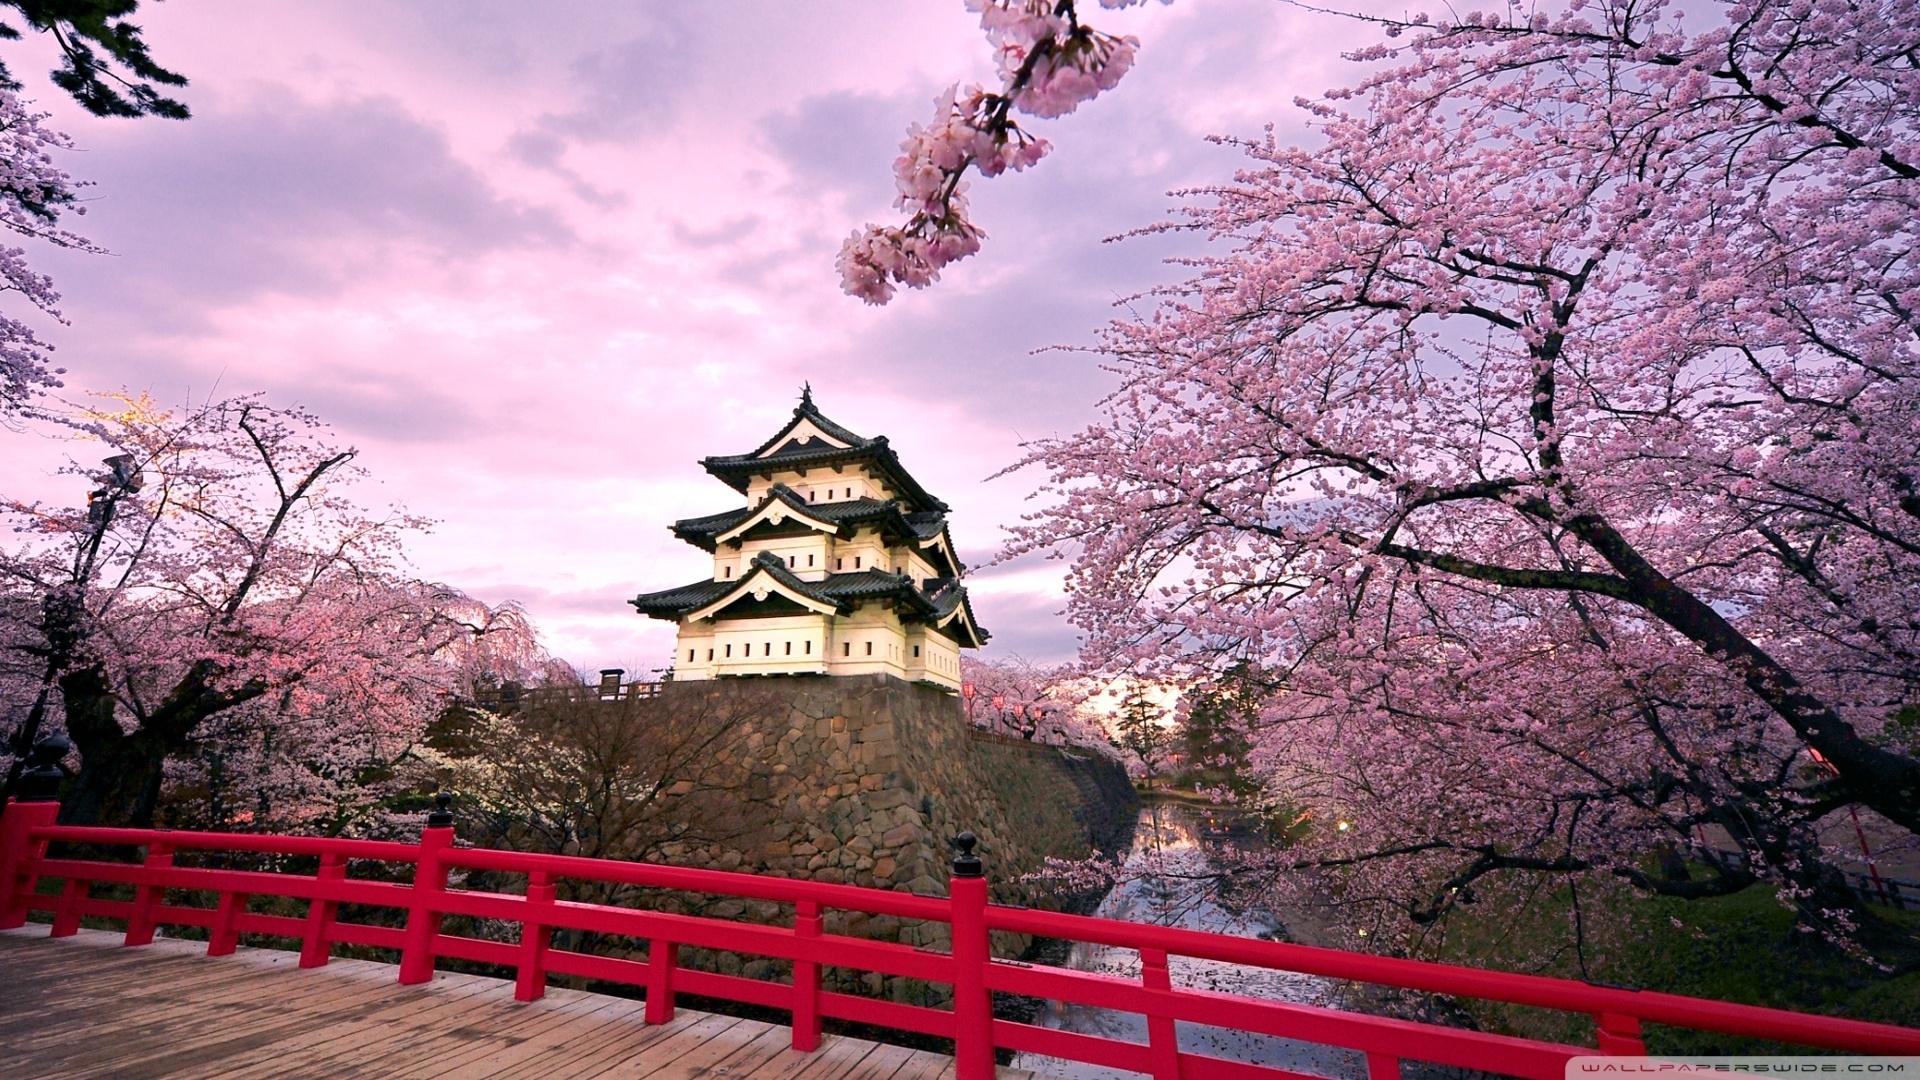 cherry blossoms, japan ❤ 4k hd desktop wallpaper for 4k ultra hd tv